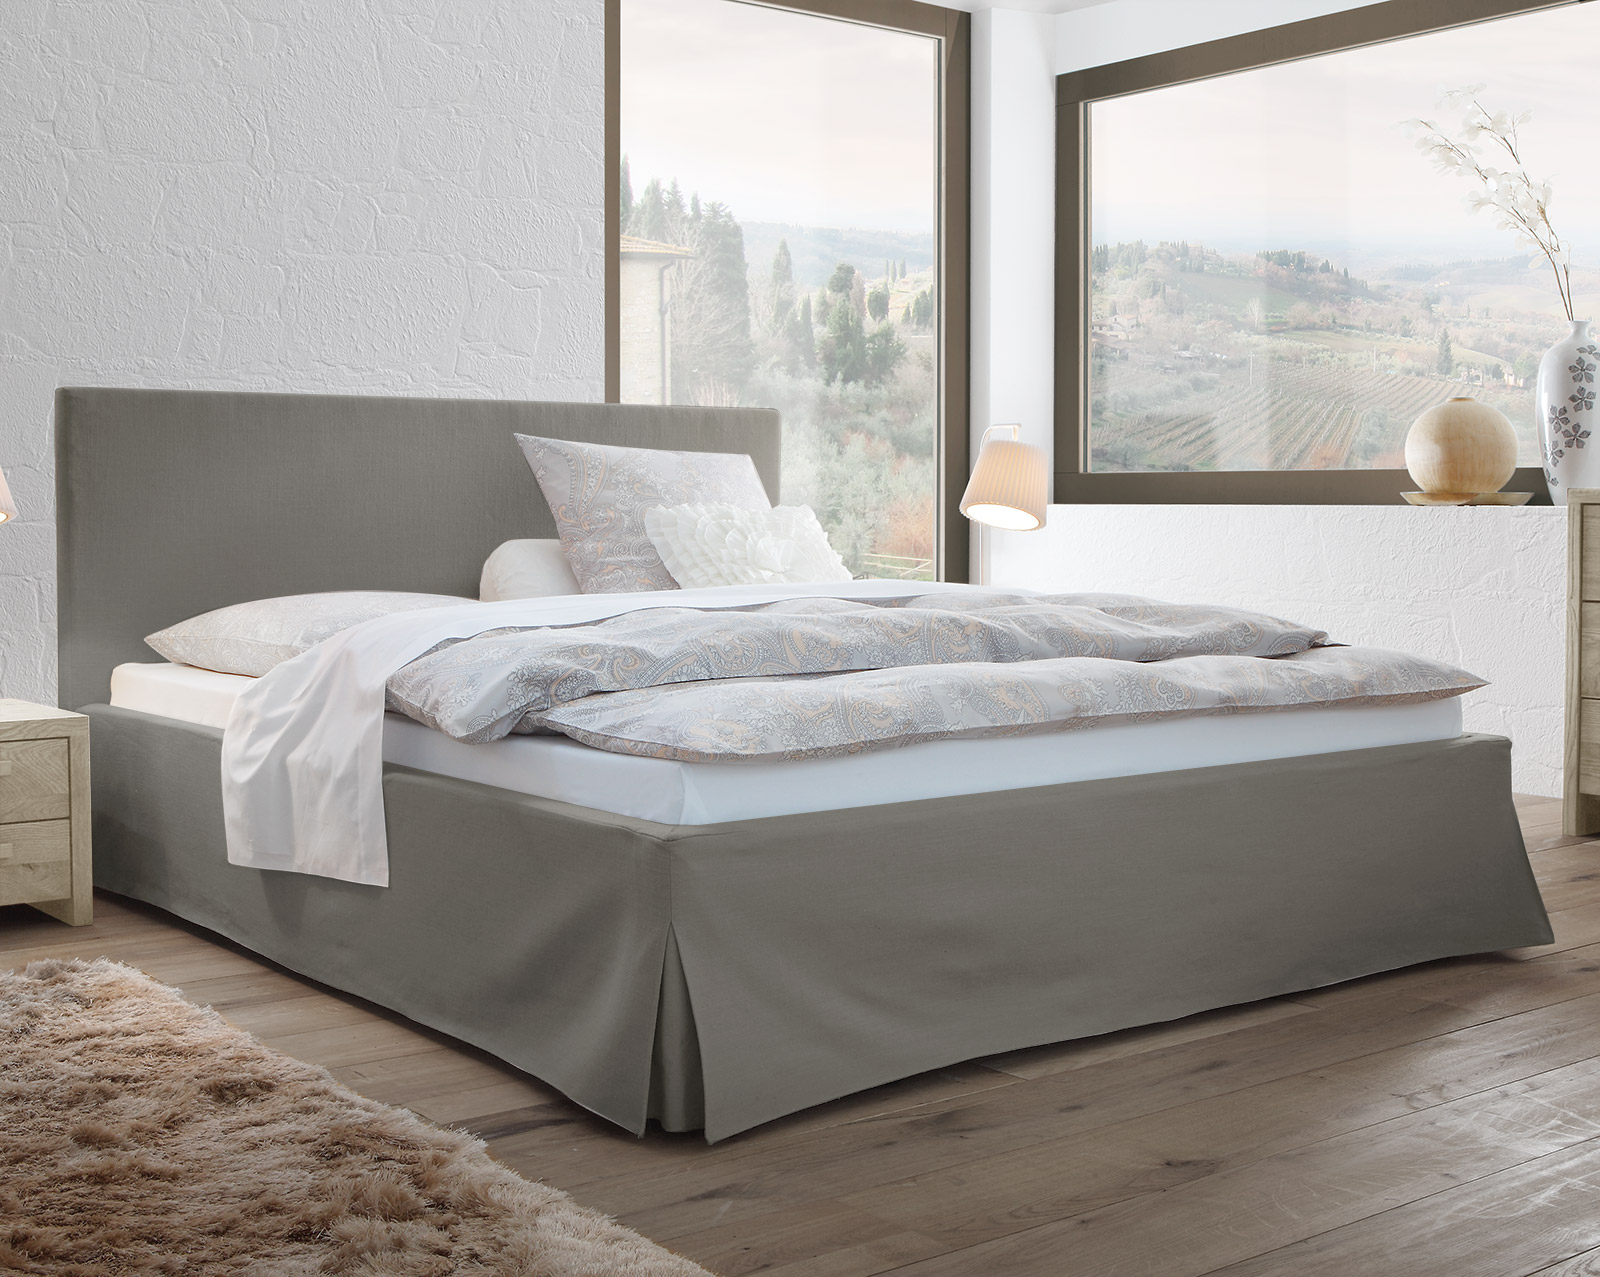 kopfteil bett gepolstert kopfteil bett gepolstert aurele breite 162 cm g nstig bett kopfteil. Black Bedroom Furniture Sets. Home Design Ideas